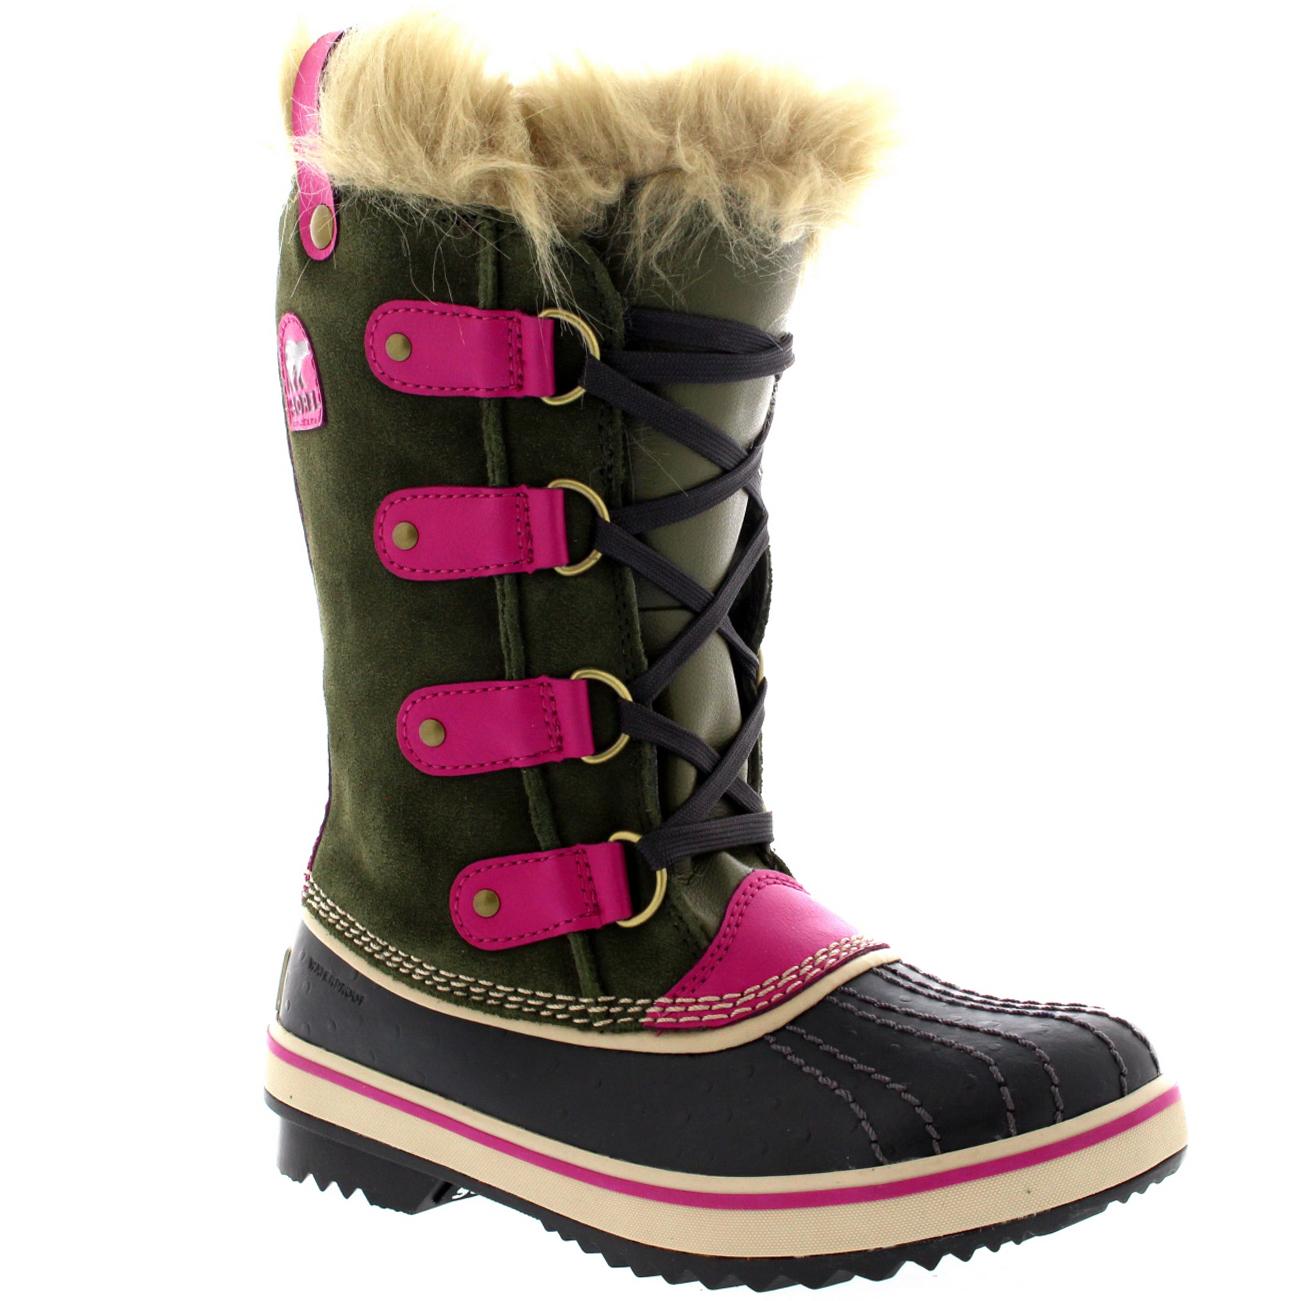 Unisex Kids Youth Sorel Tofino Waterproof Fur Lined Snow